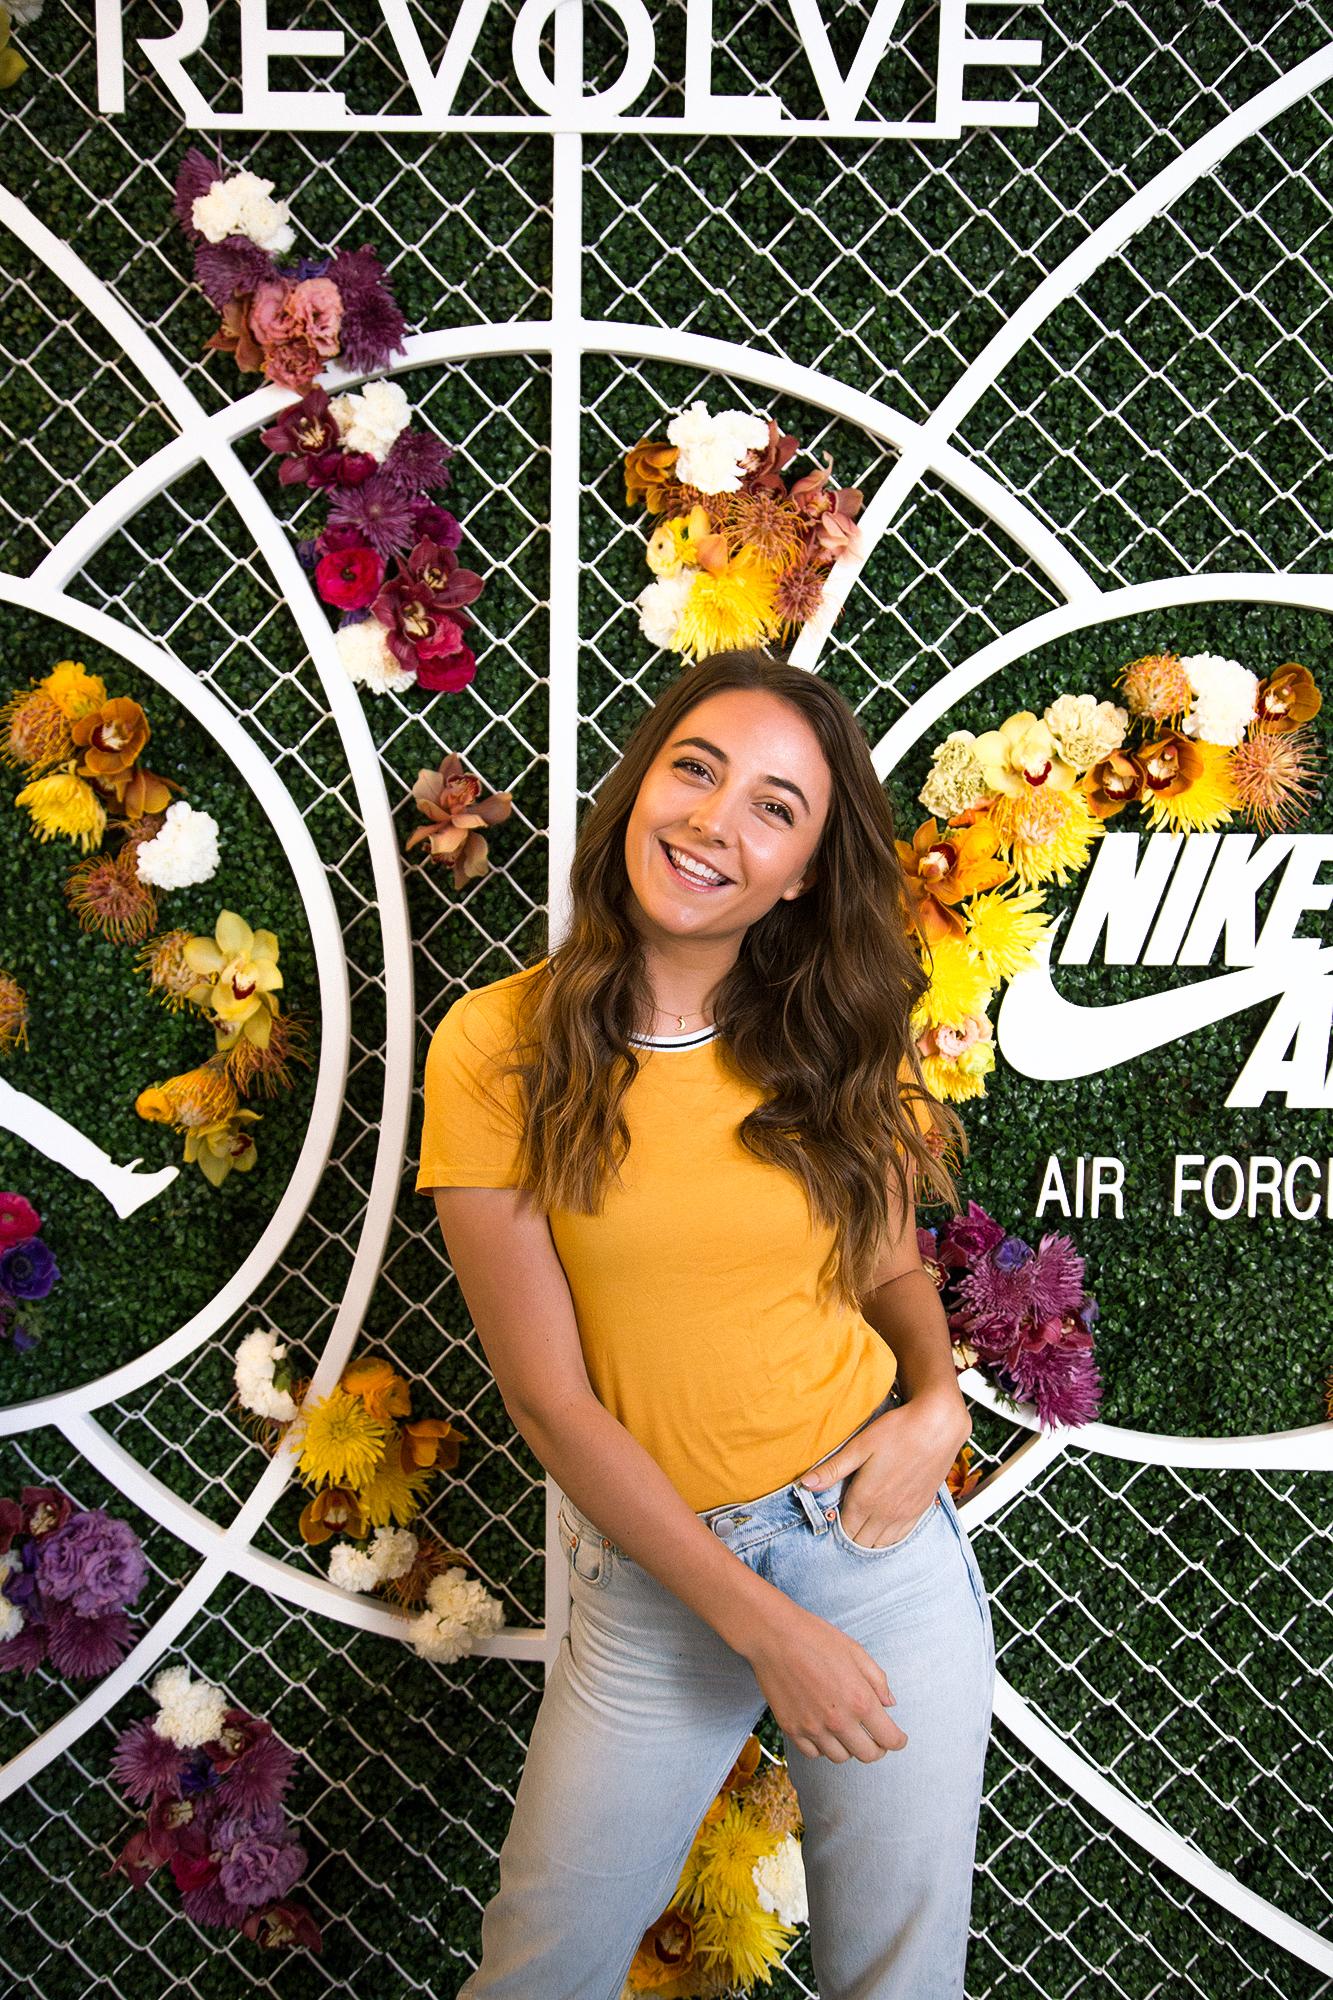 NikeXRevolve-4.jpg